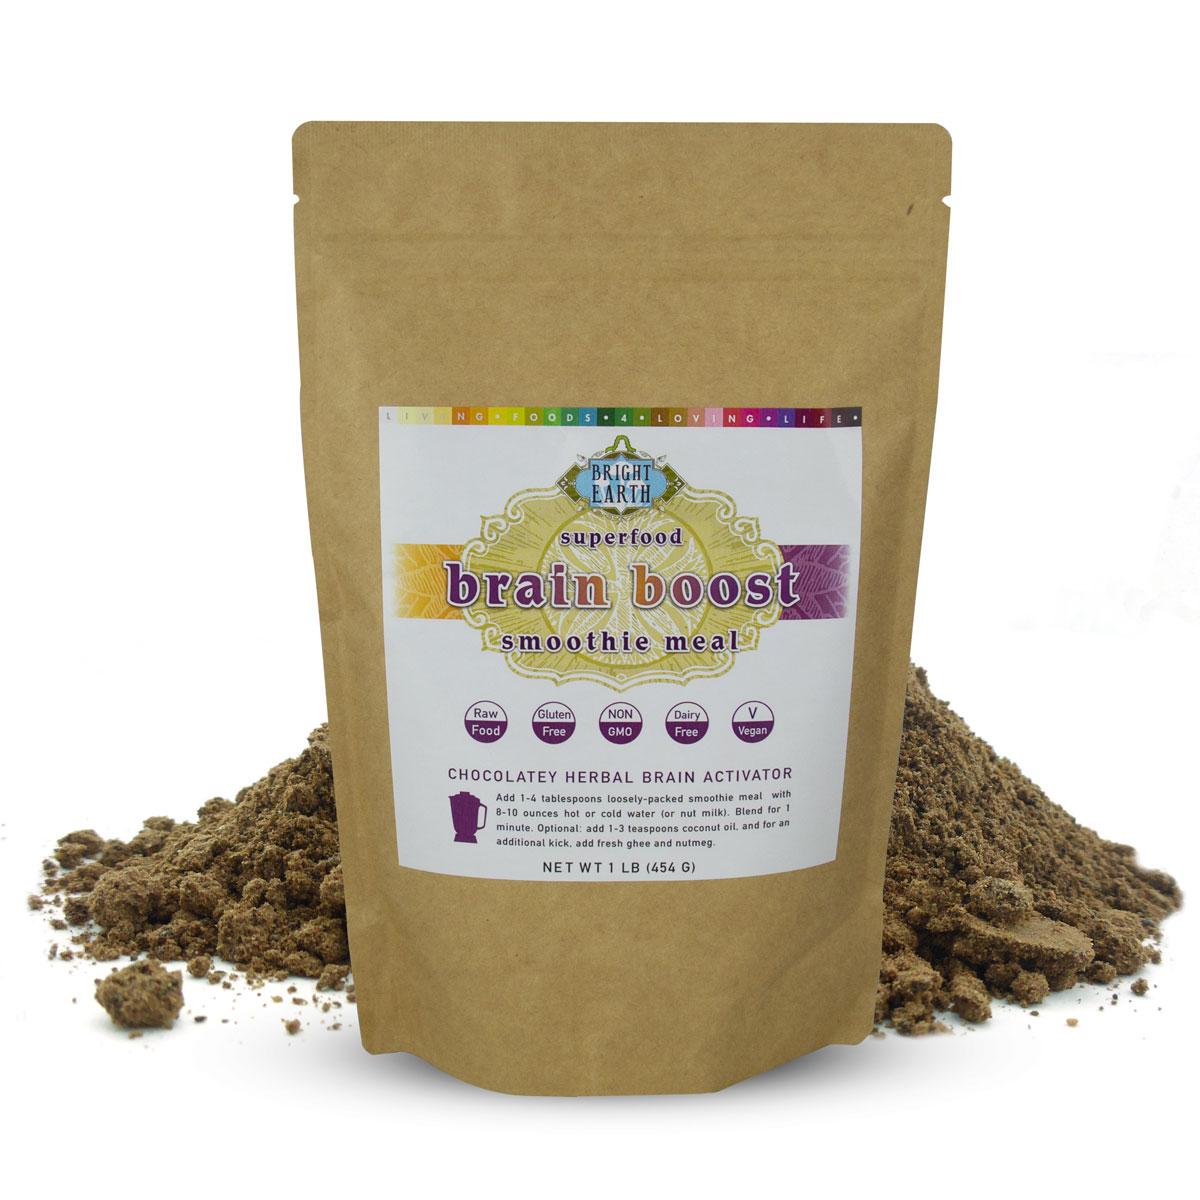 Organic Raw Vegan Brain Boost Superfood Smoothie